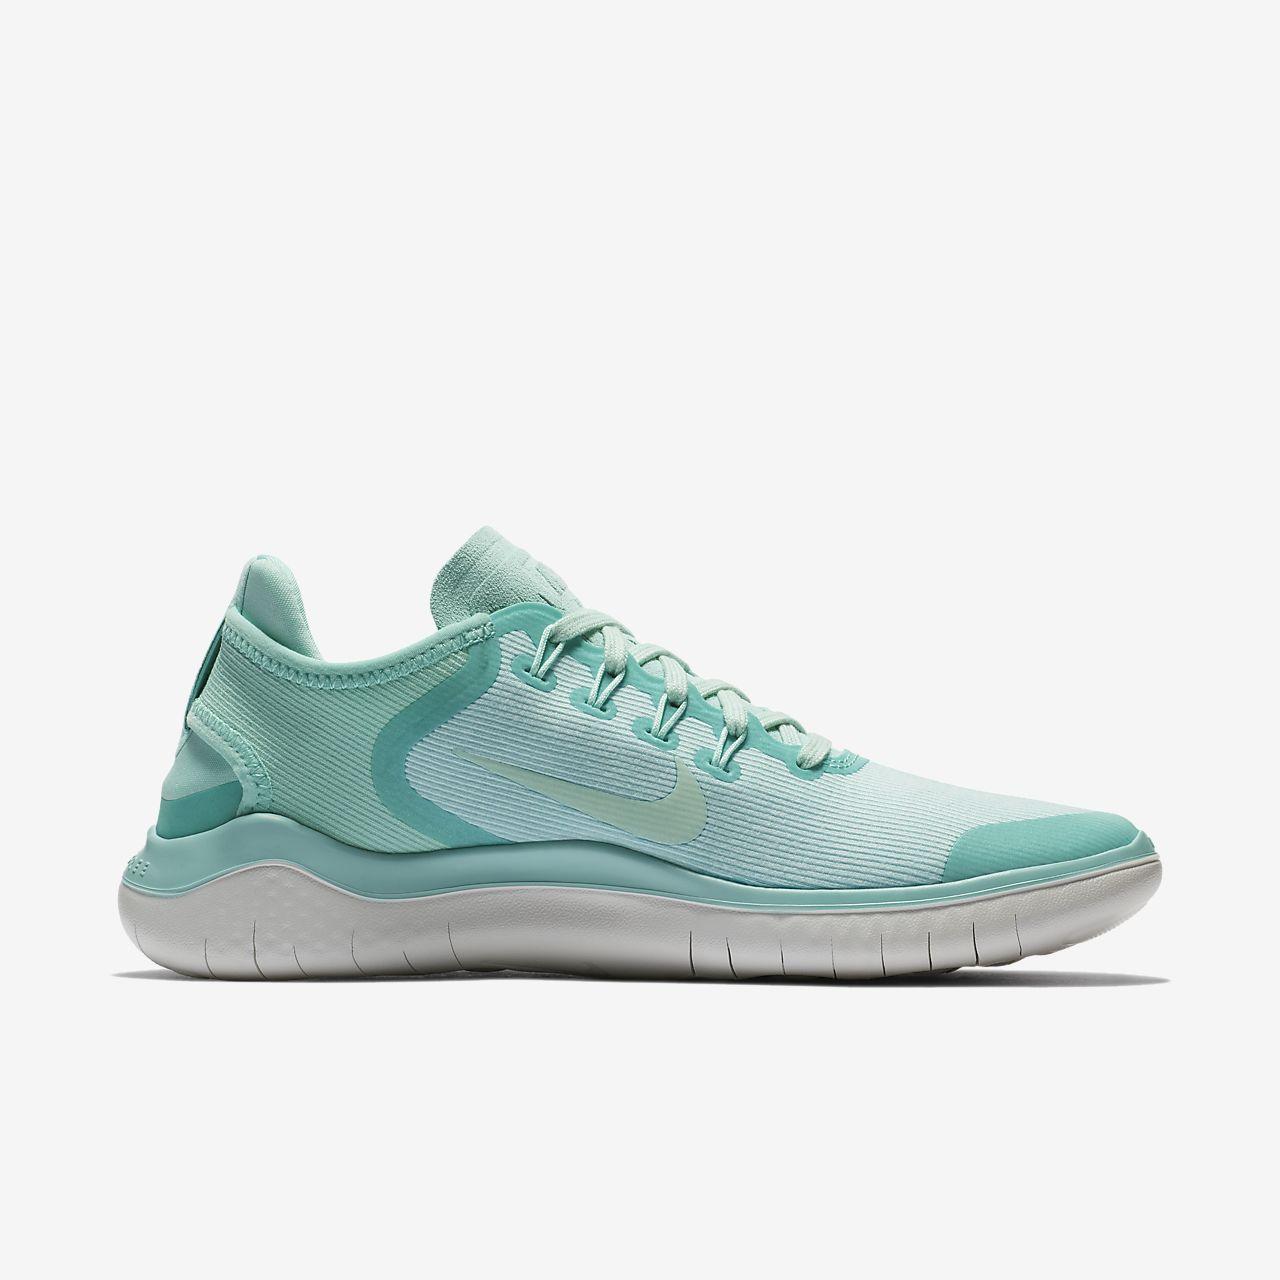 Chaussures Zamberlan bleues femme  LX809 black NIKE WMNS NIKE FREE RN 2018 Sneakers & Tennis basses femme. NIKE WMNS NIKE FREE RN 2018 Sneakers & Tennis basses femme. 7QDT4CY